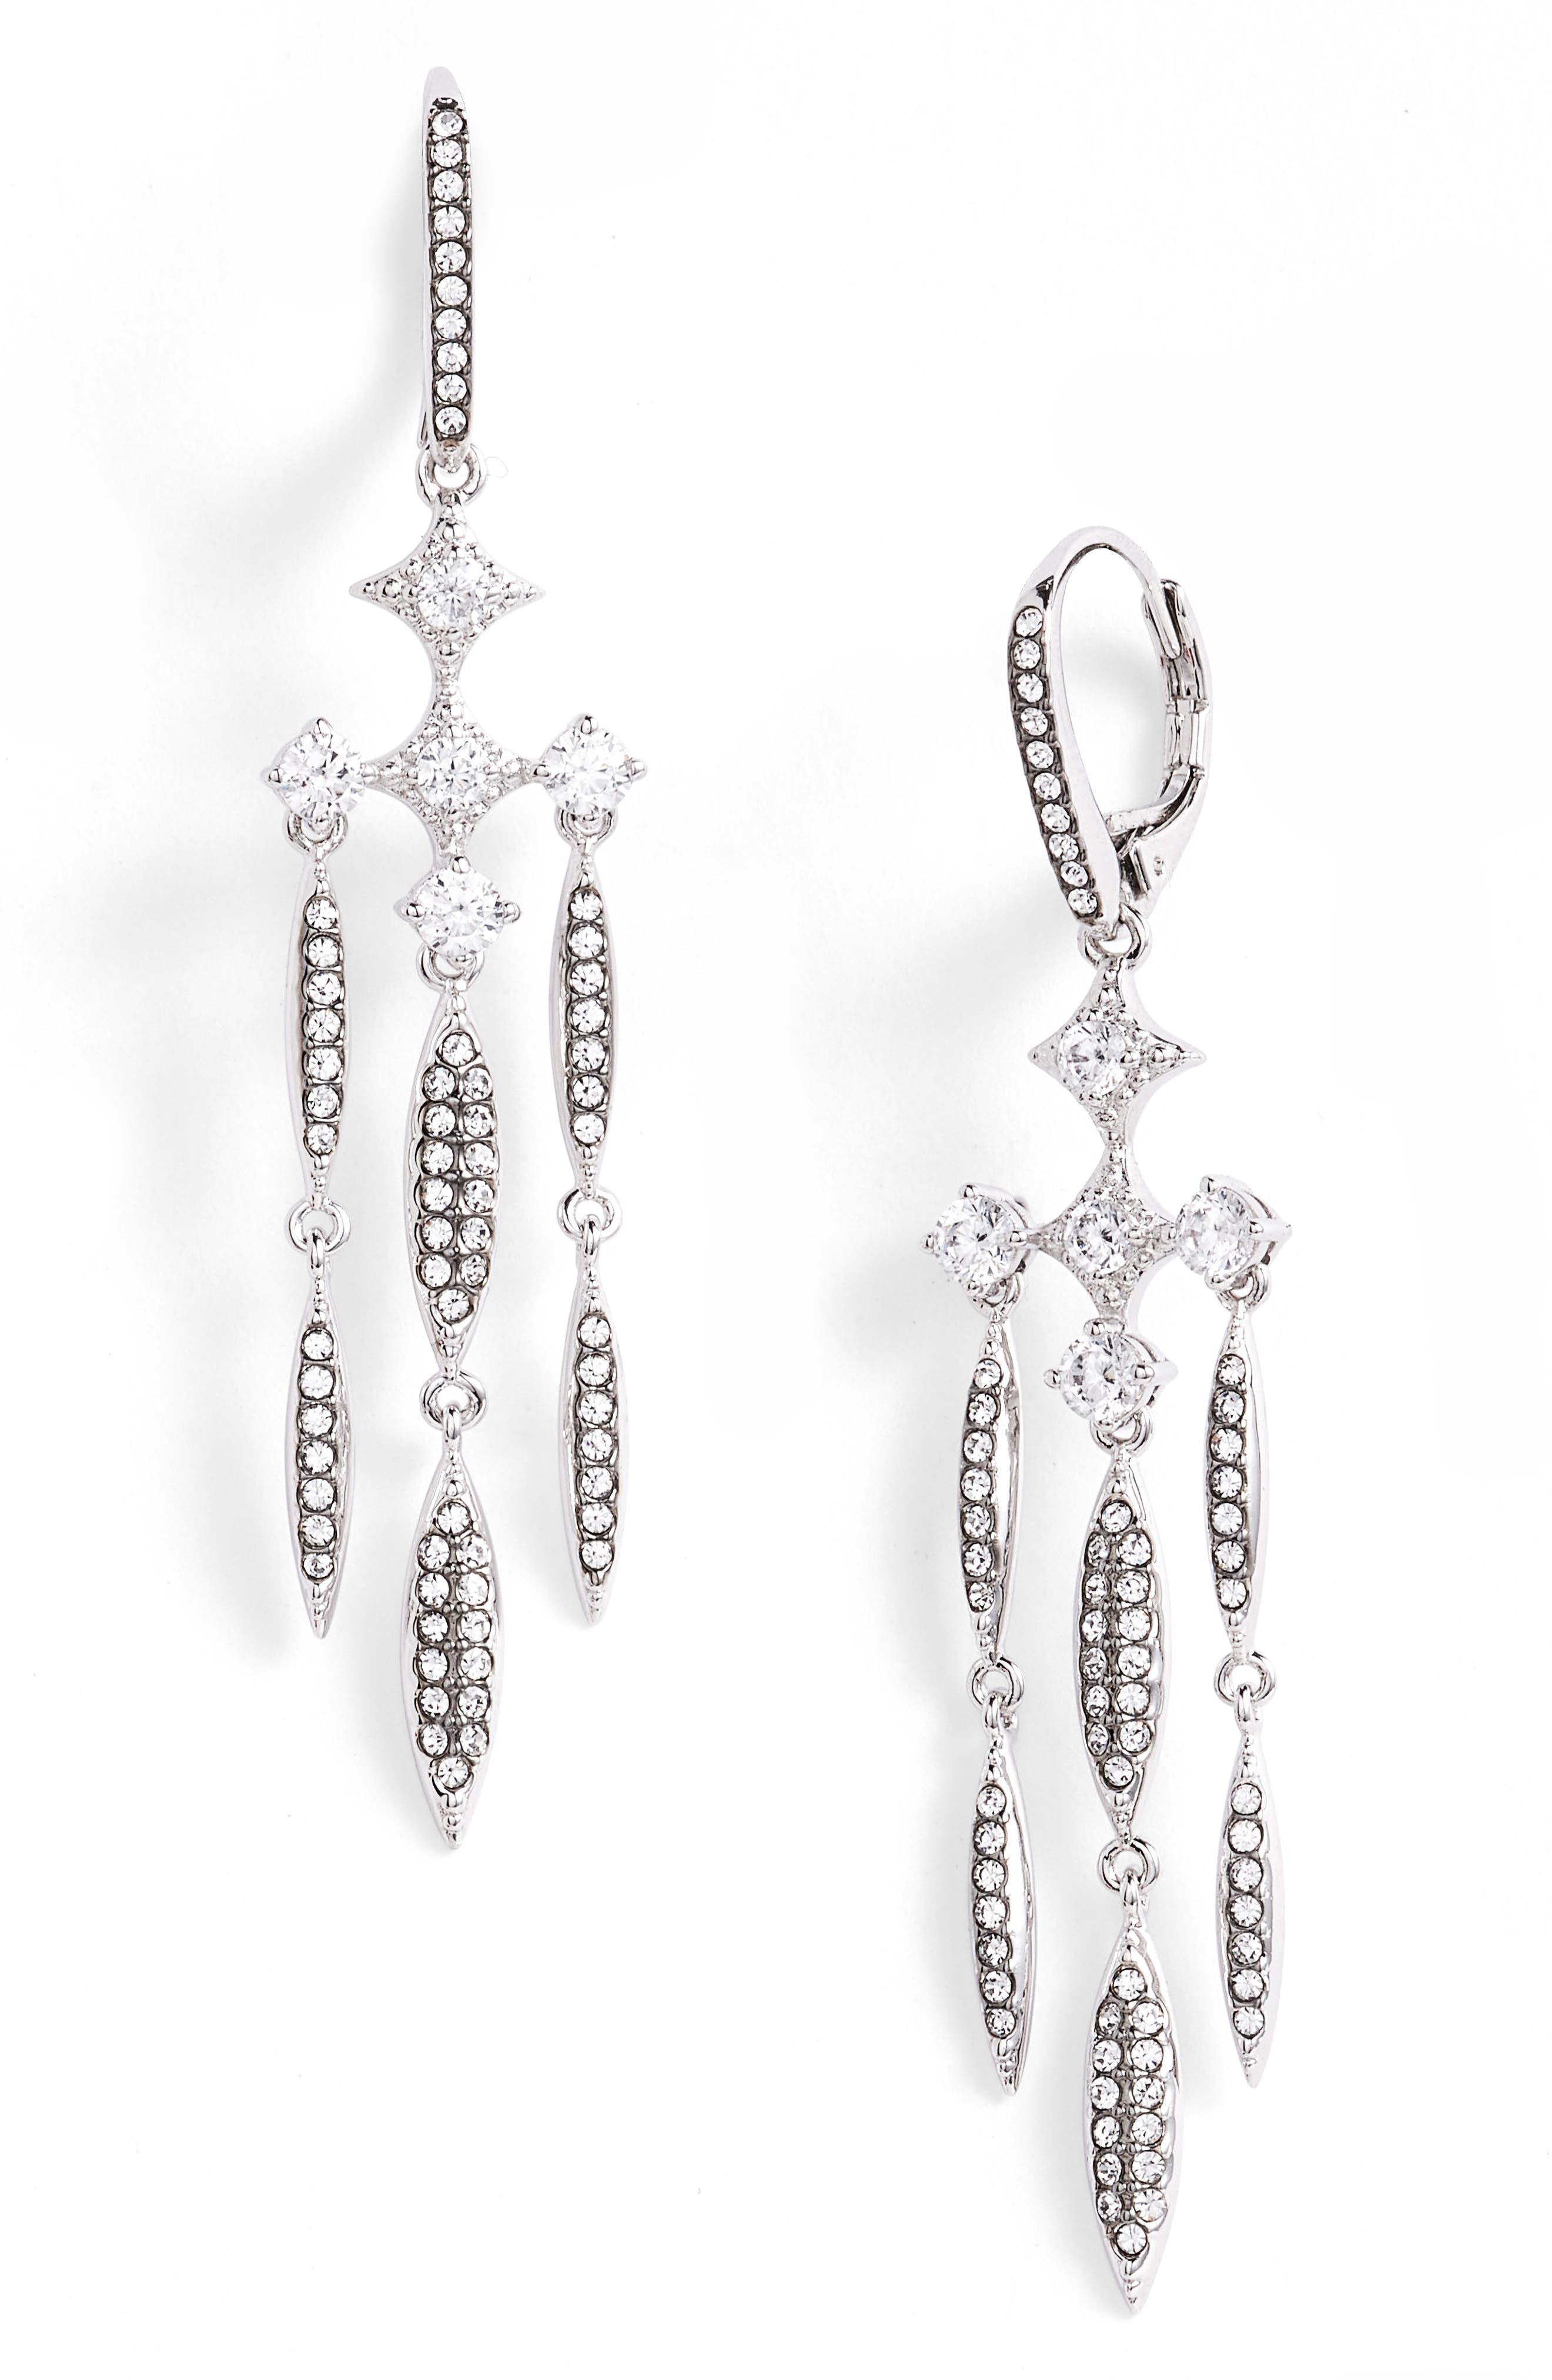 Cardamom Chandelier Earrings,                         Main,                         color, Black / Silver